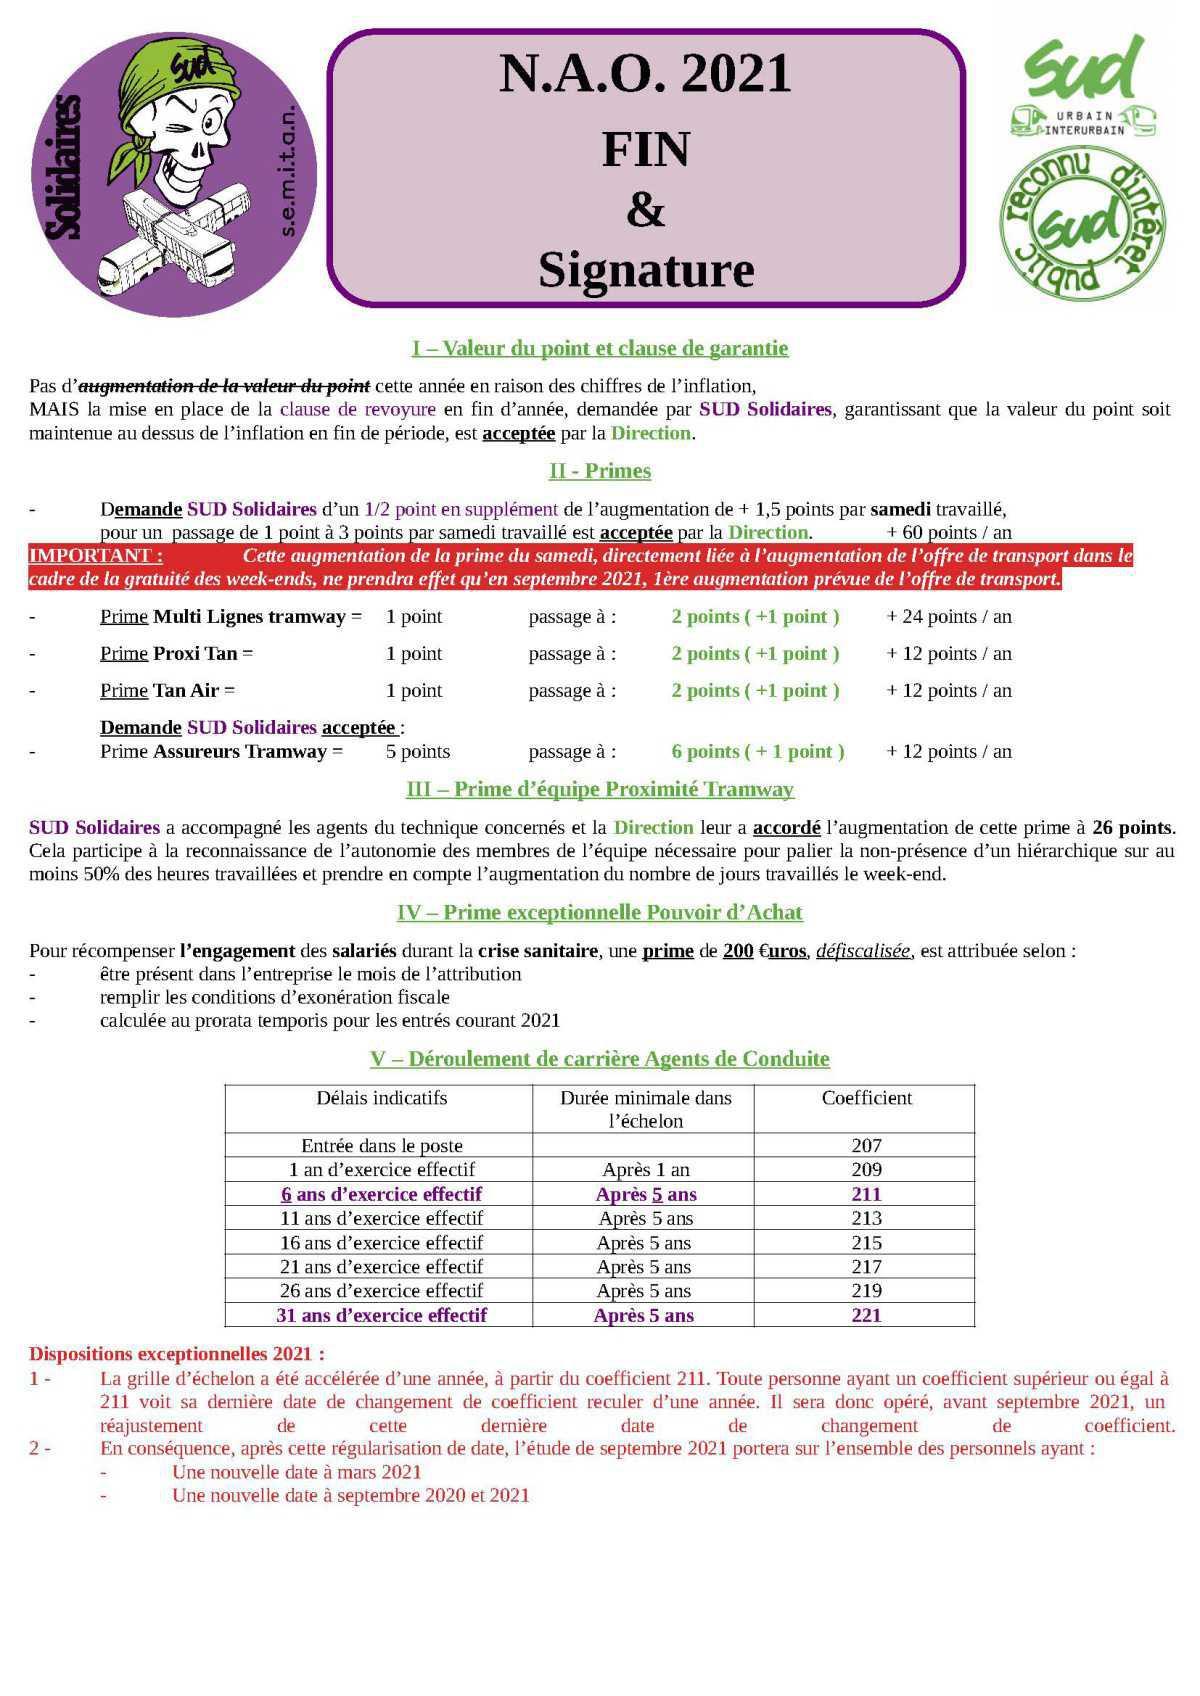 Signature NAO 2021 SEMITAN